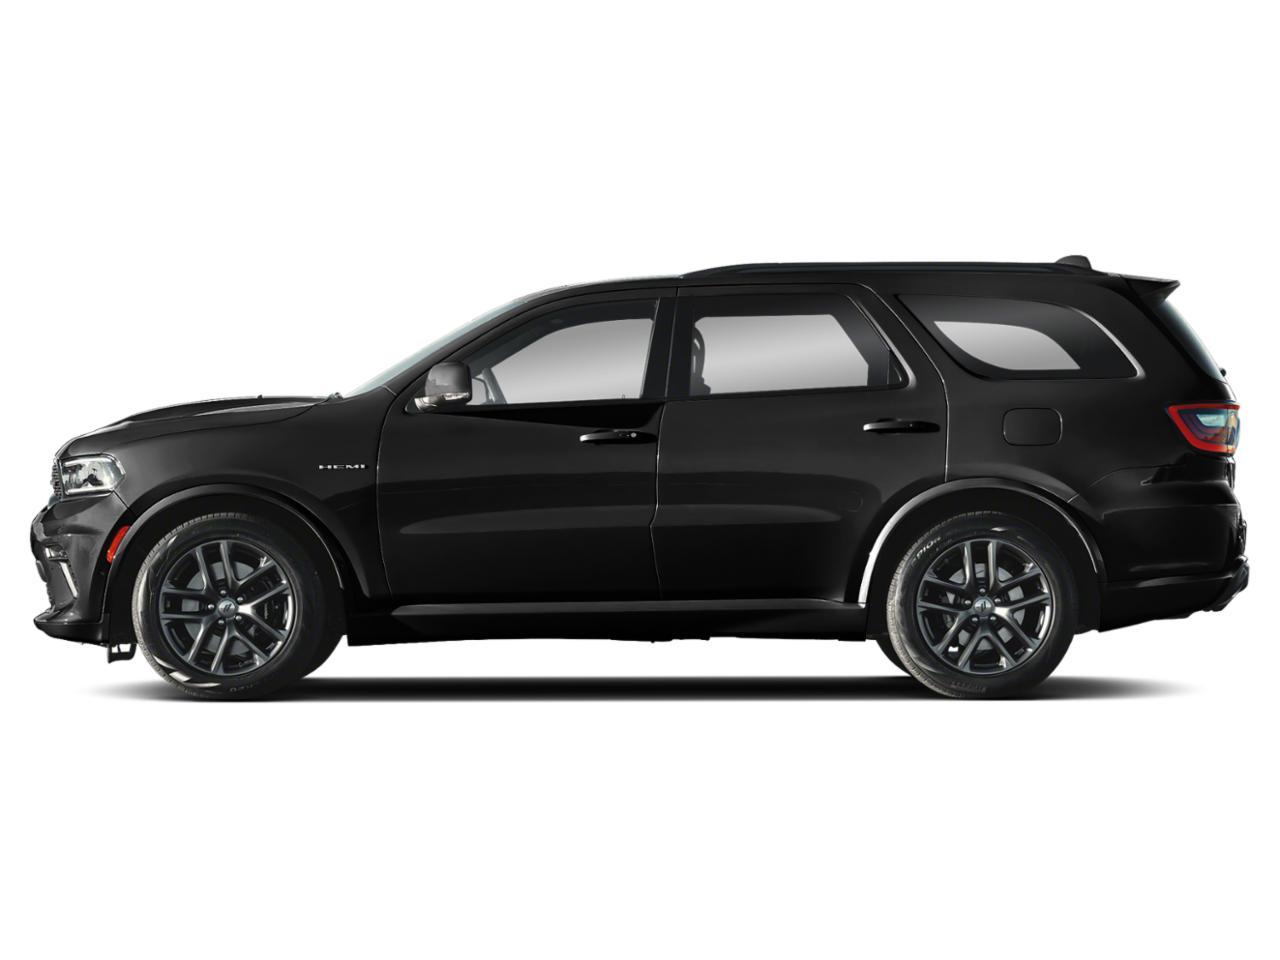 Black Clearcoat 2021 Dodge Durango For Sale At Bergstrom Automotive Vin 1c4rdjdg5mc599202